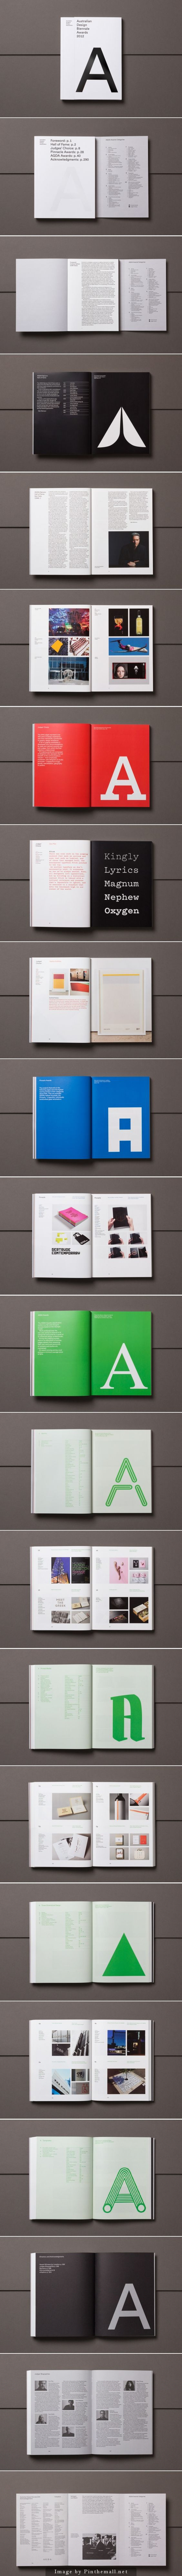 agda-awards-book